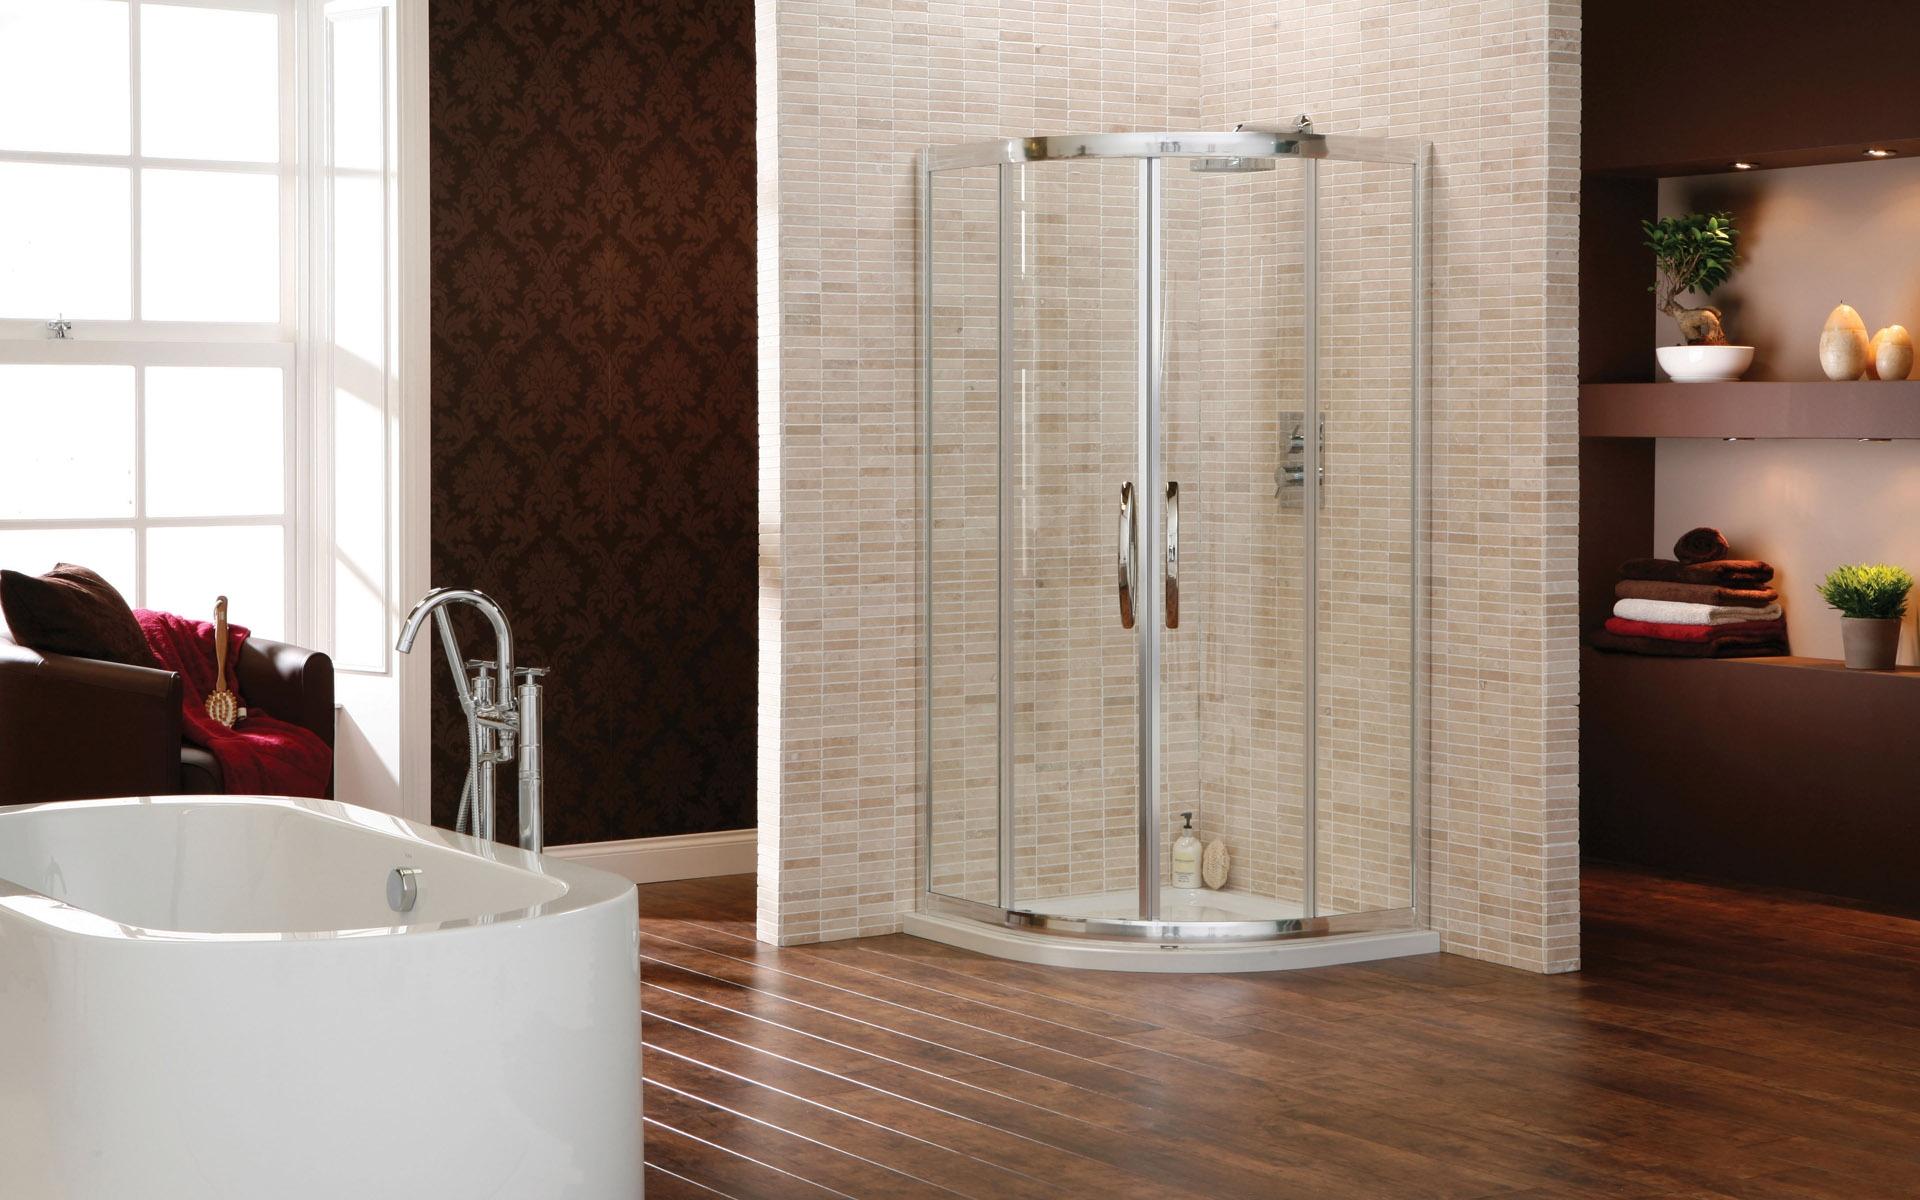 Fondos de pantalla habitaci n interior ba era ducha for Piso ducha bano